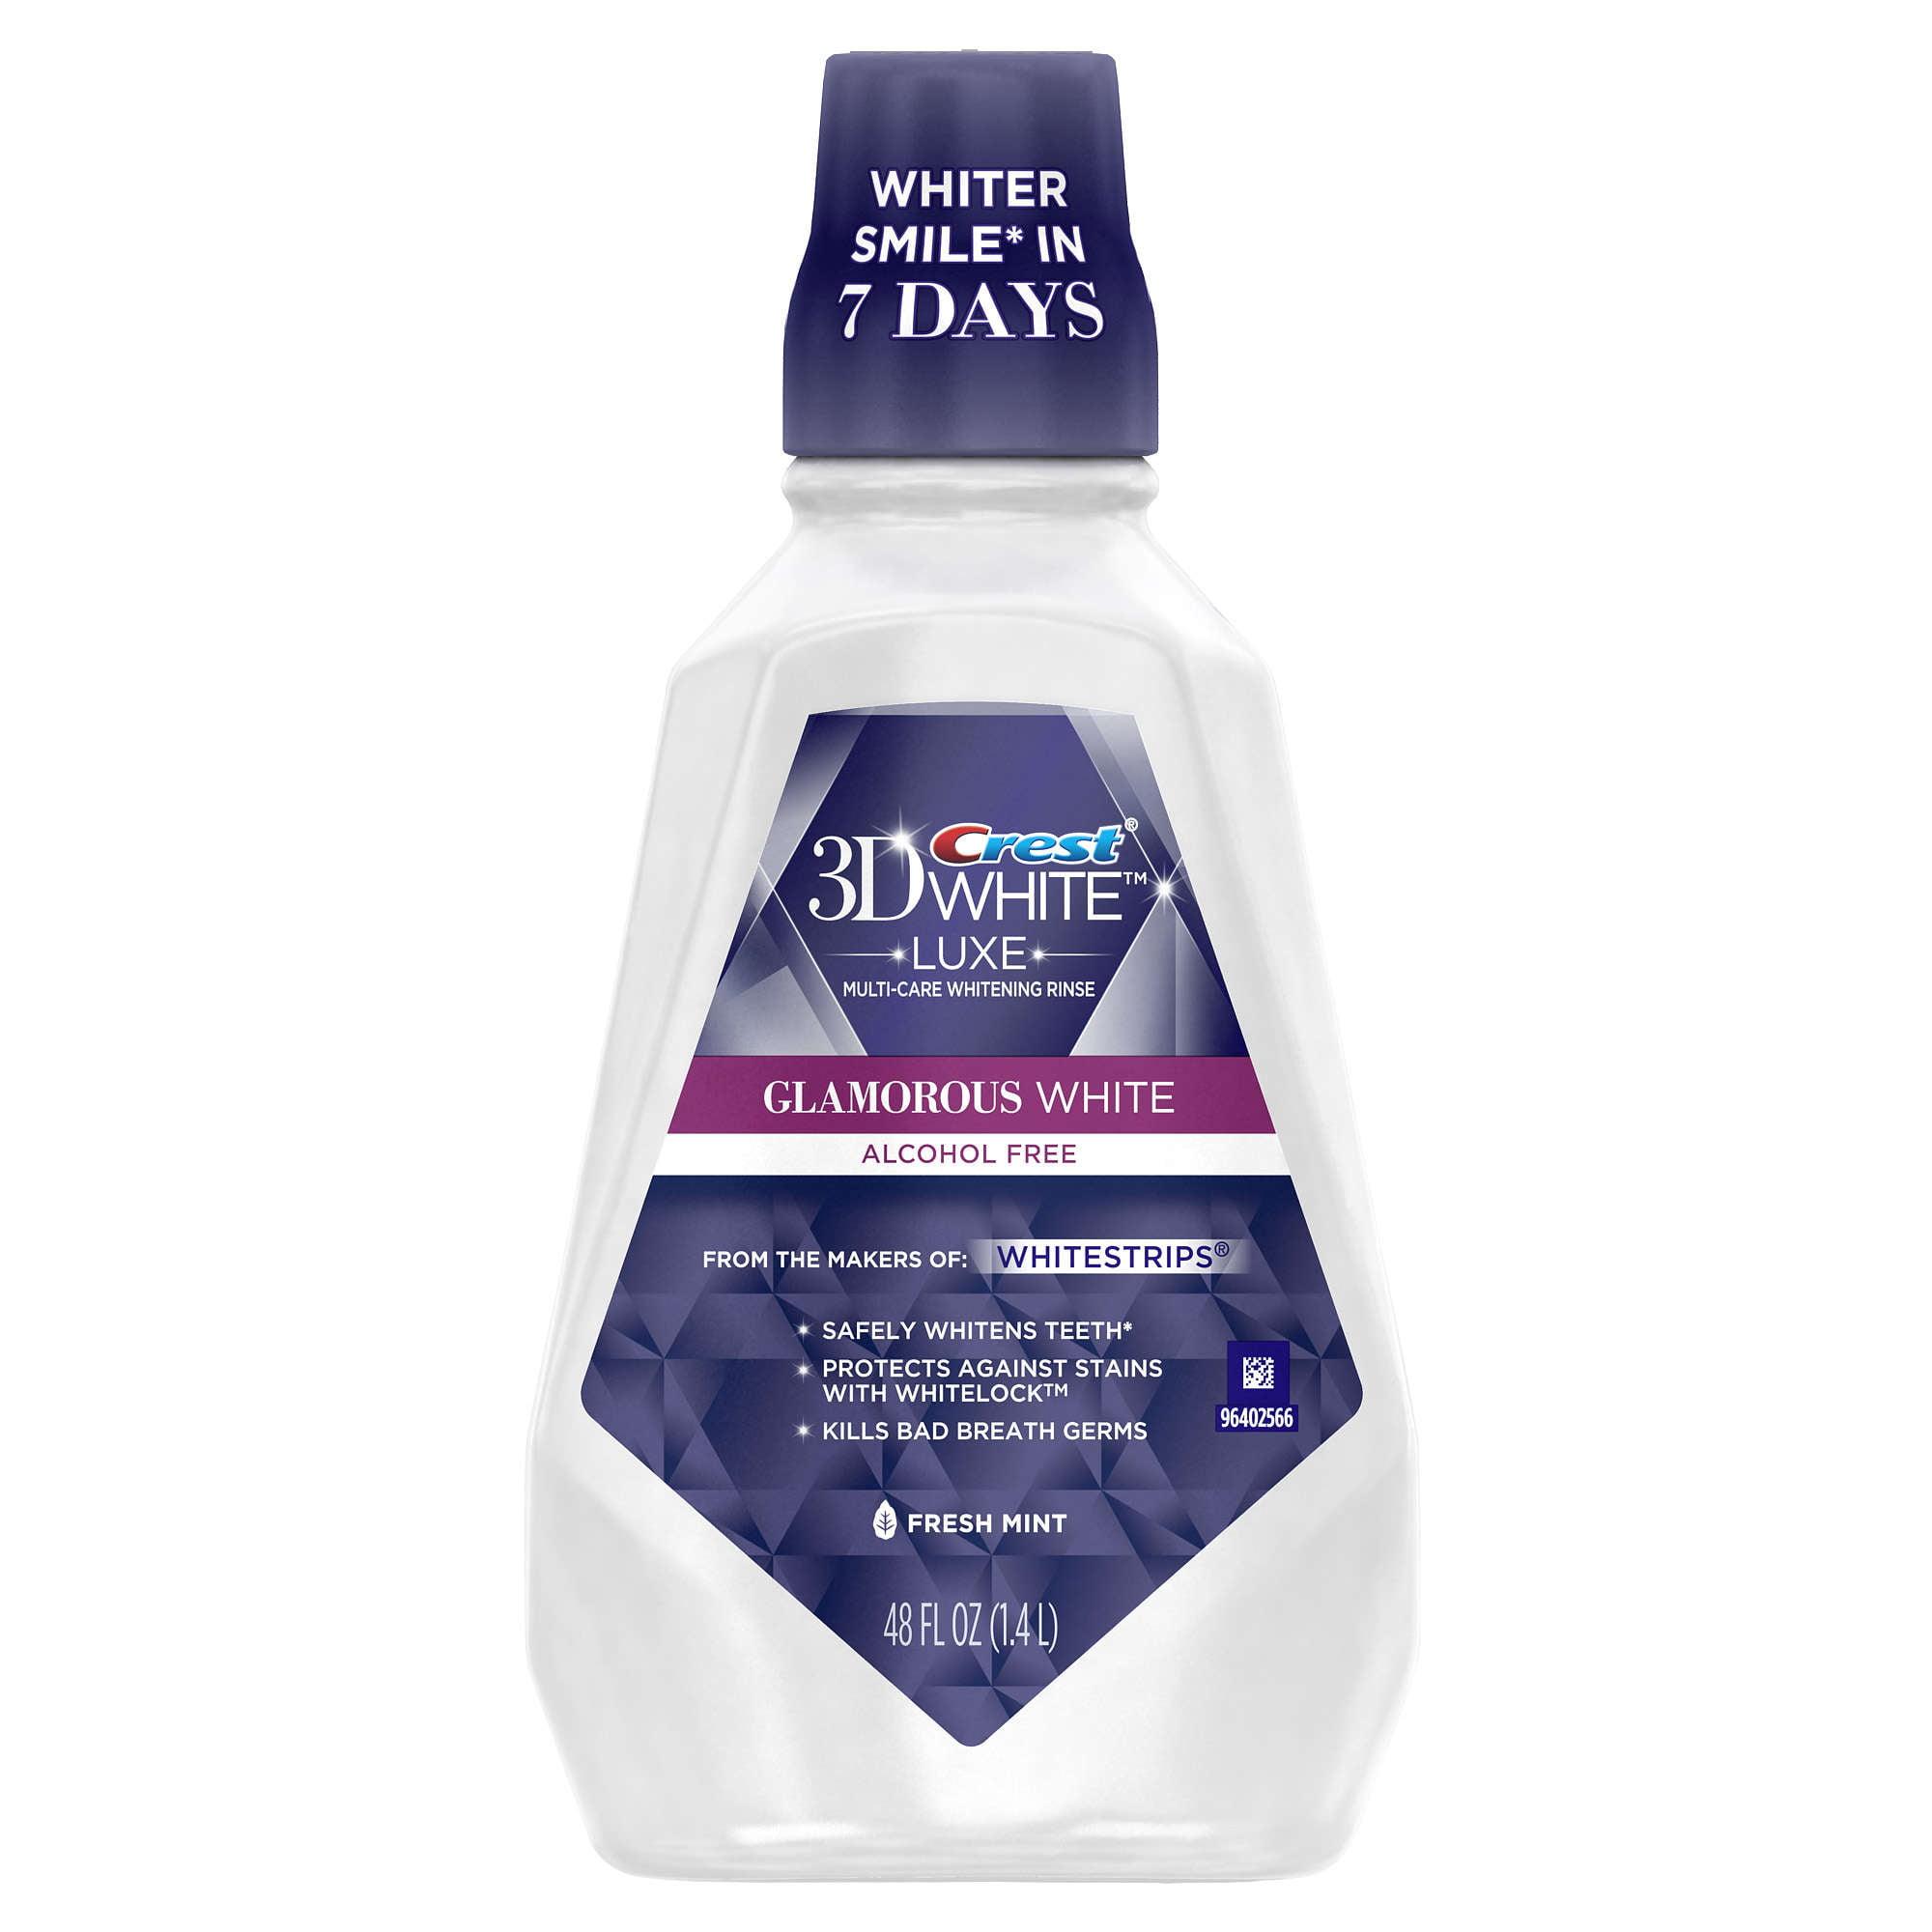 Crest 3D White Luxe Whitening Mouthwash, Fresh Mint, 48 Fl